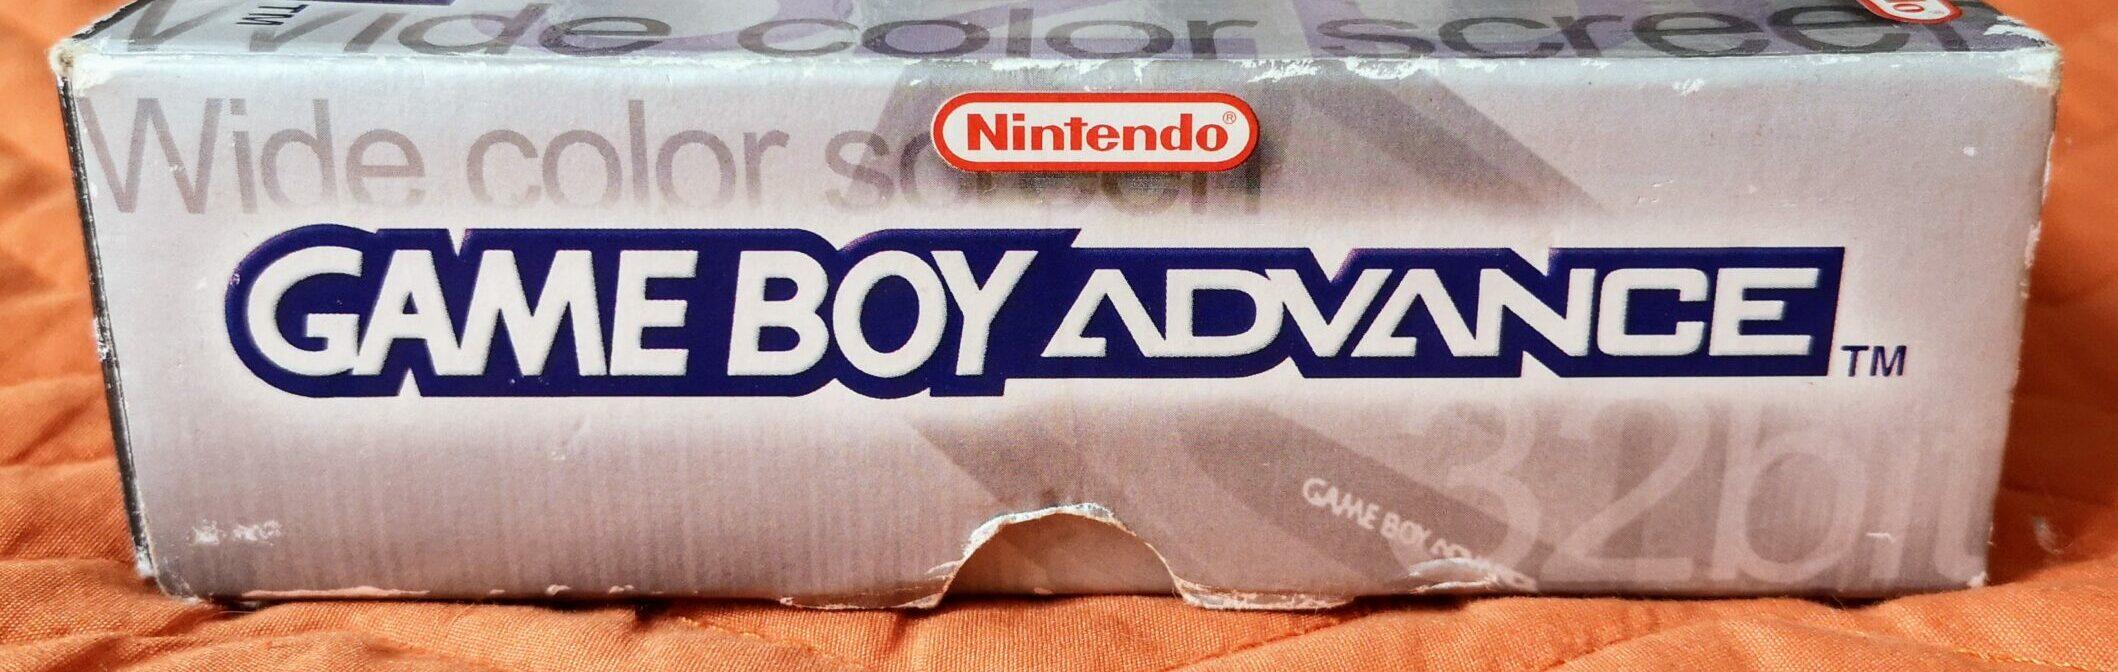 Game Boy Advance, scatola lato 4